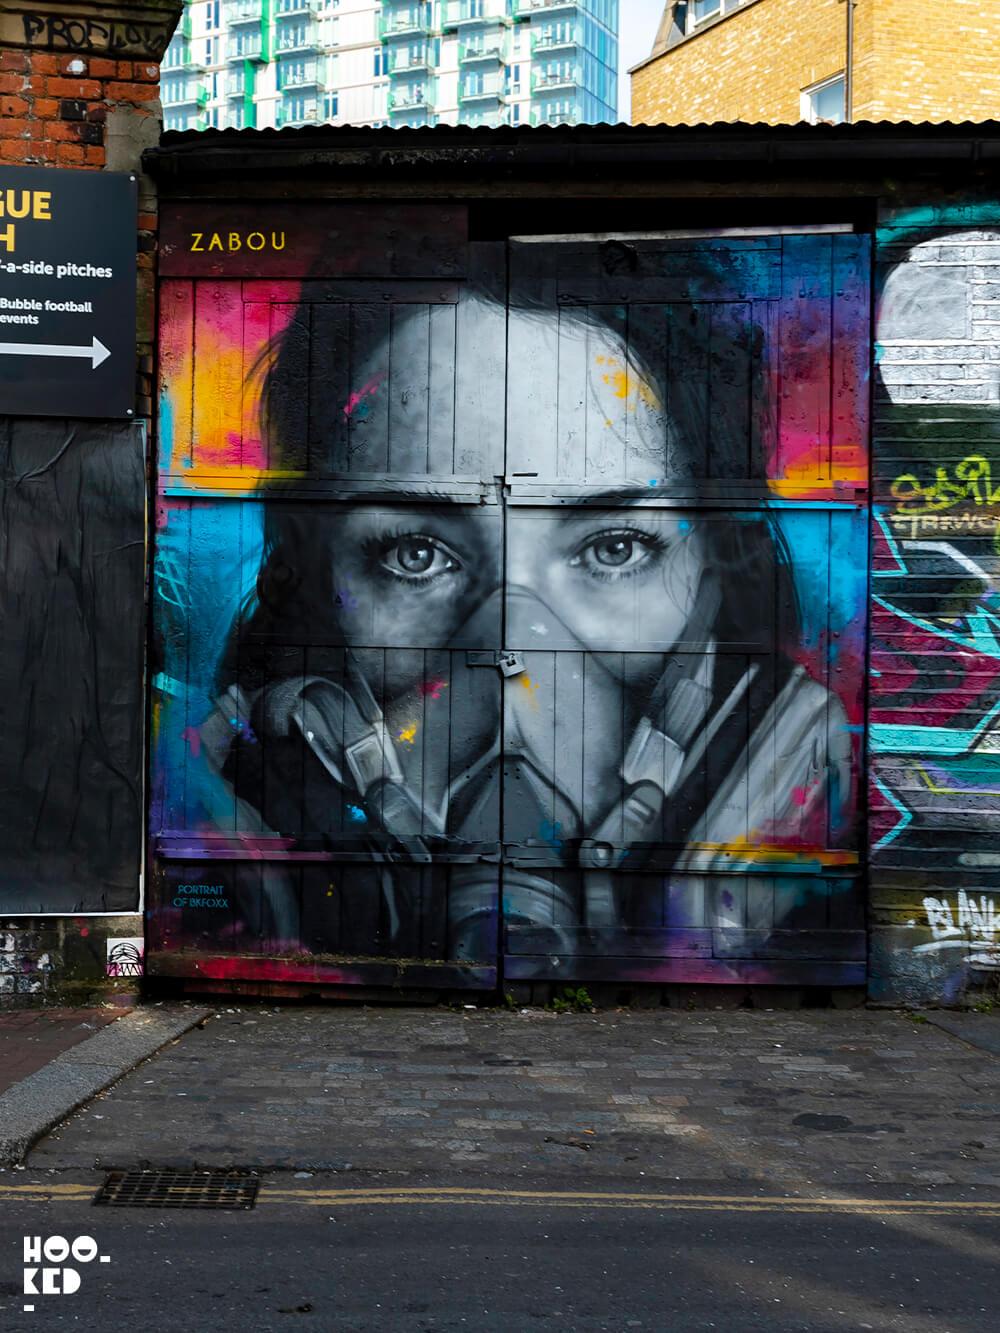 London Street art on Brick Lane by street artist Zabou